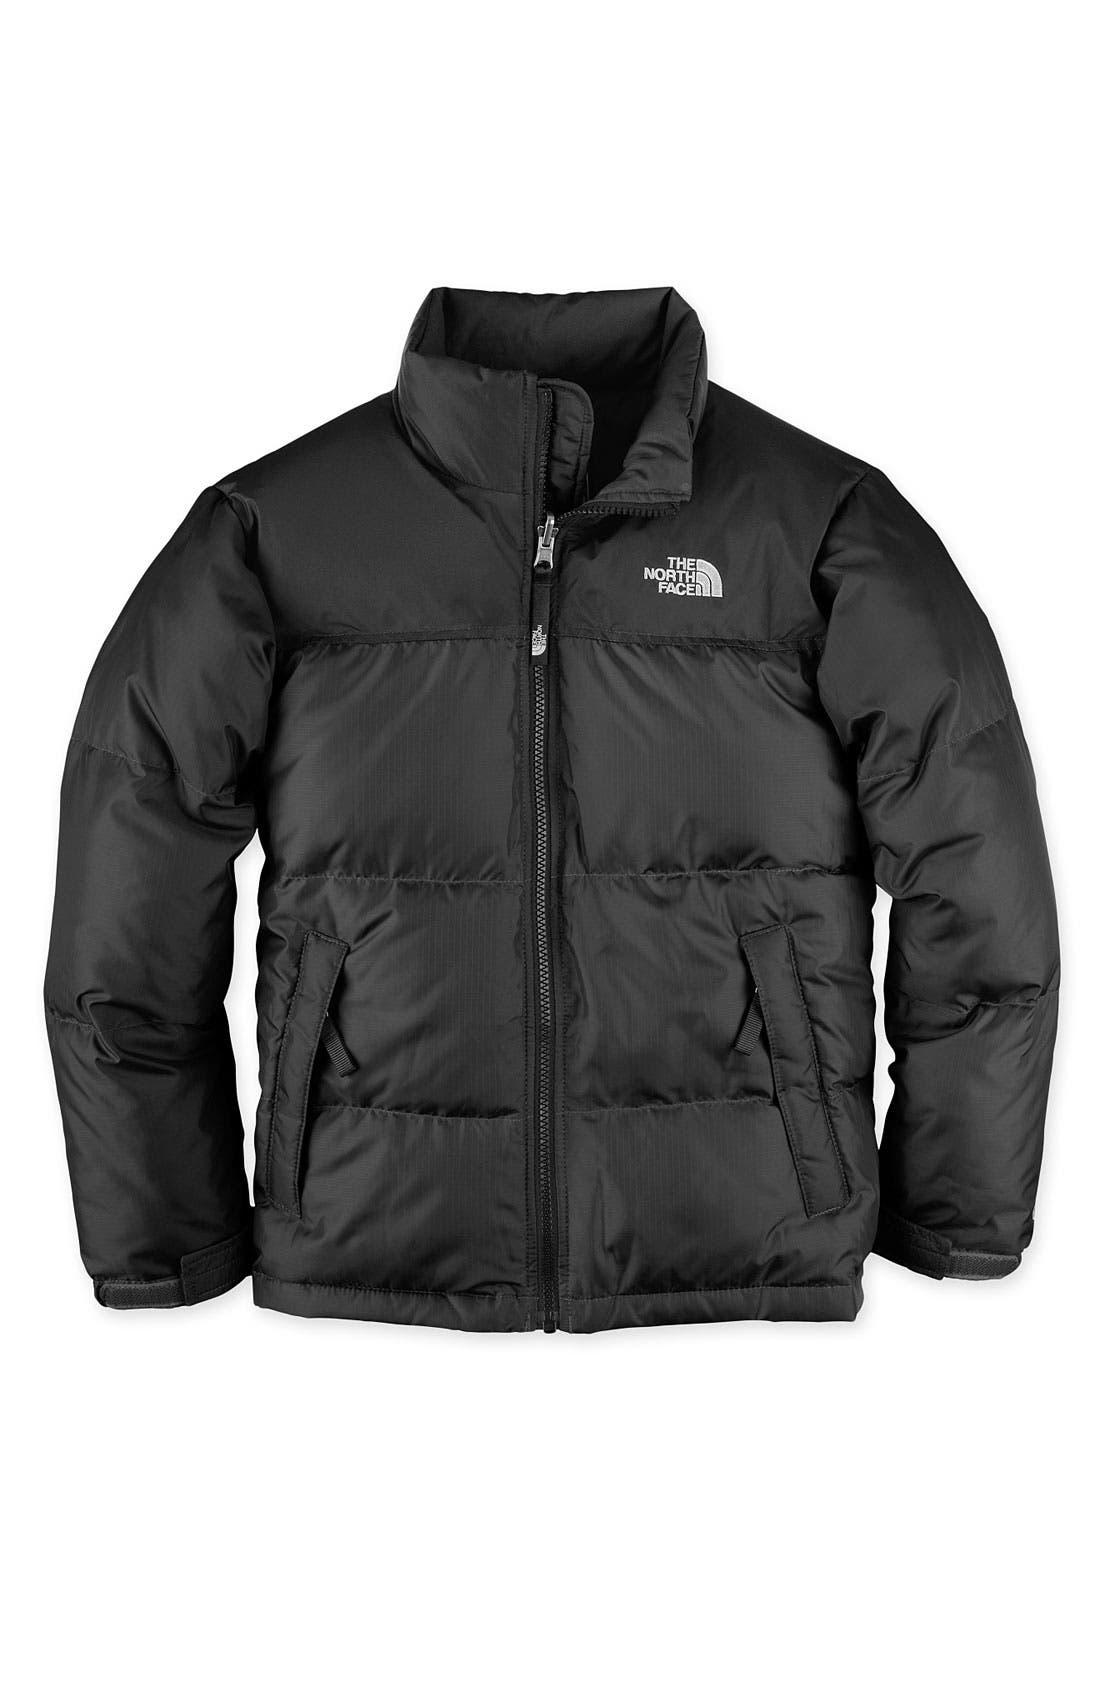 Main Image - The North Face 'Nuptse' Jacket (Little Boys)